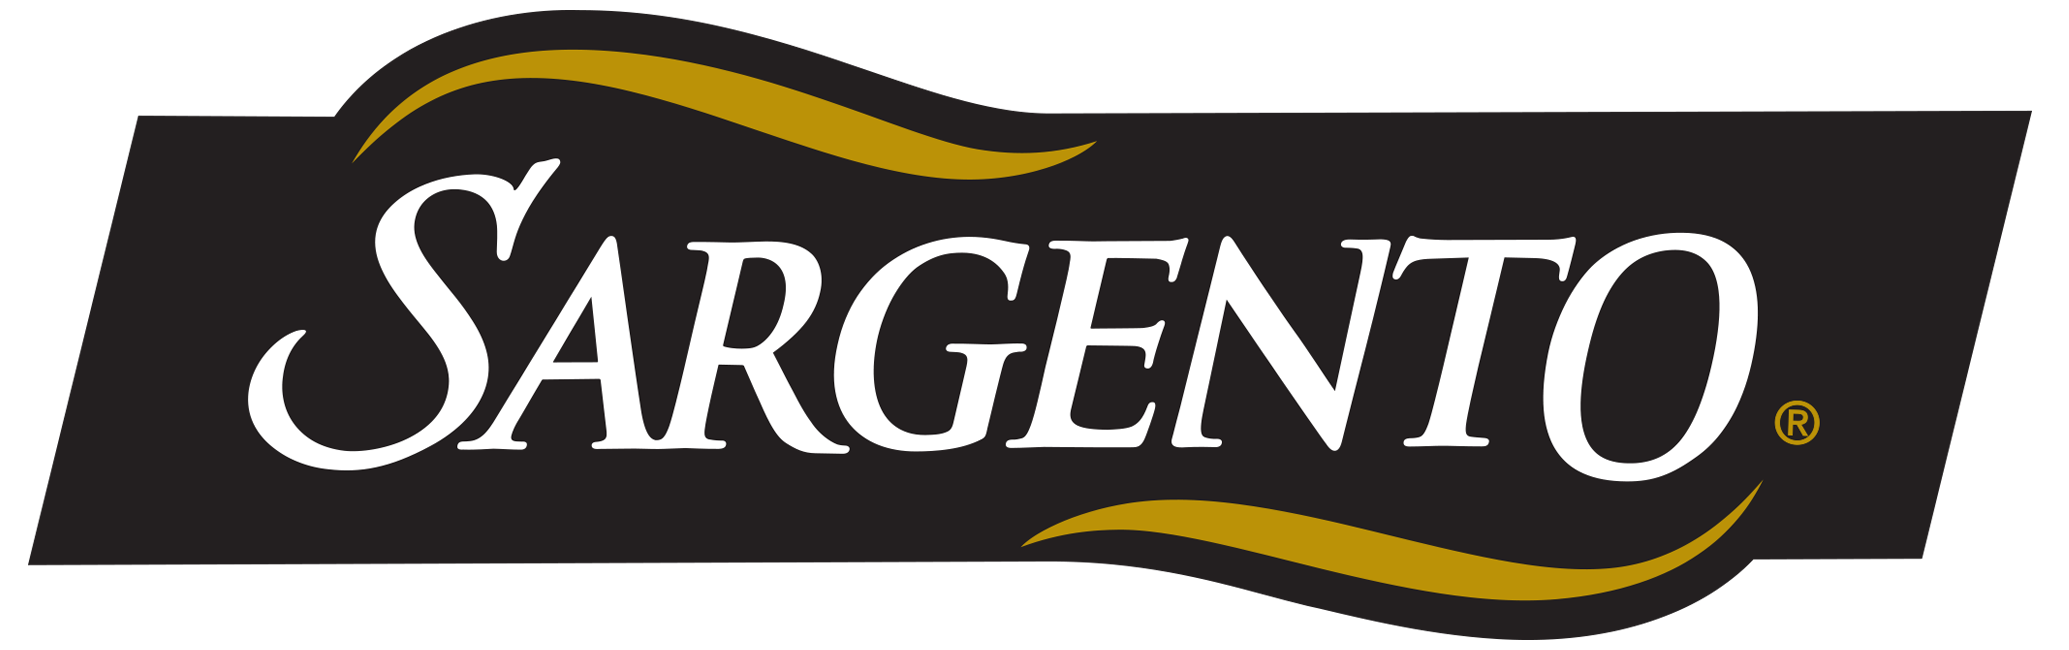 Sargento logo-straight